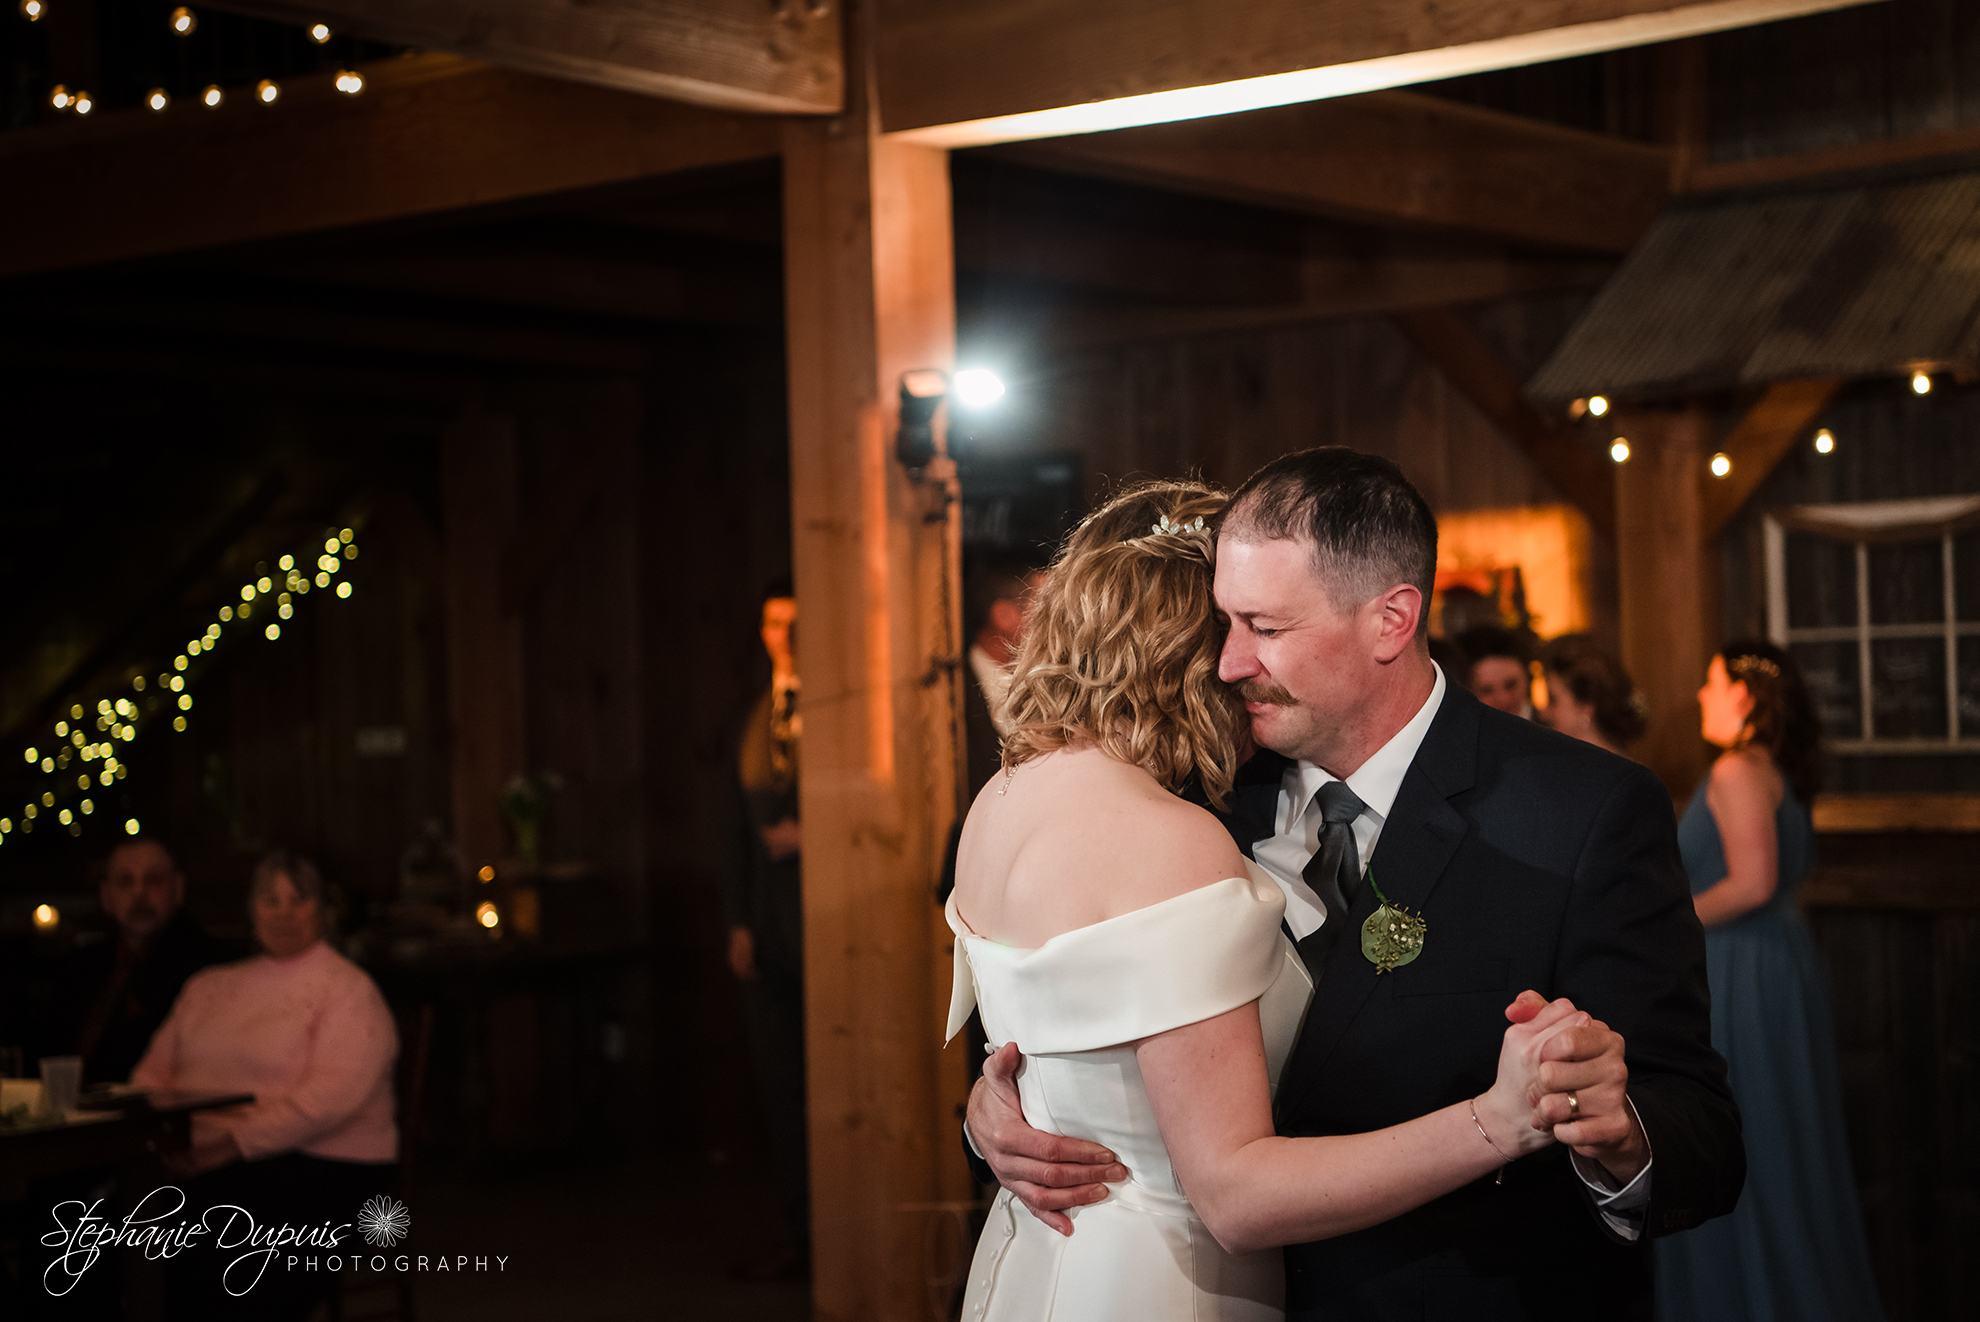 Littleton Wedding Photographer 03 2 - Portfolio: Kittle Wedding